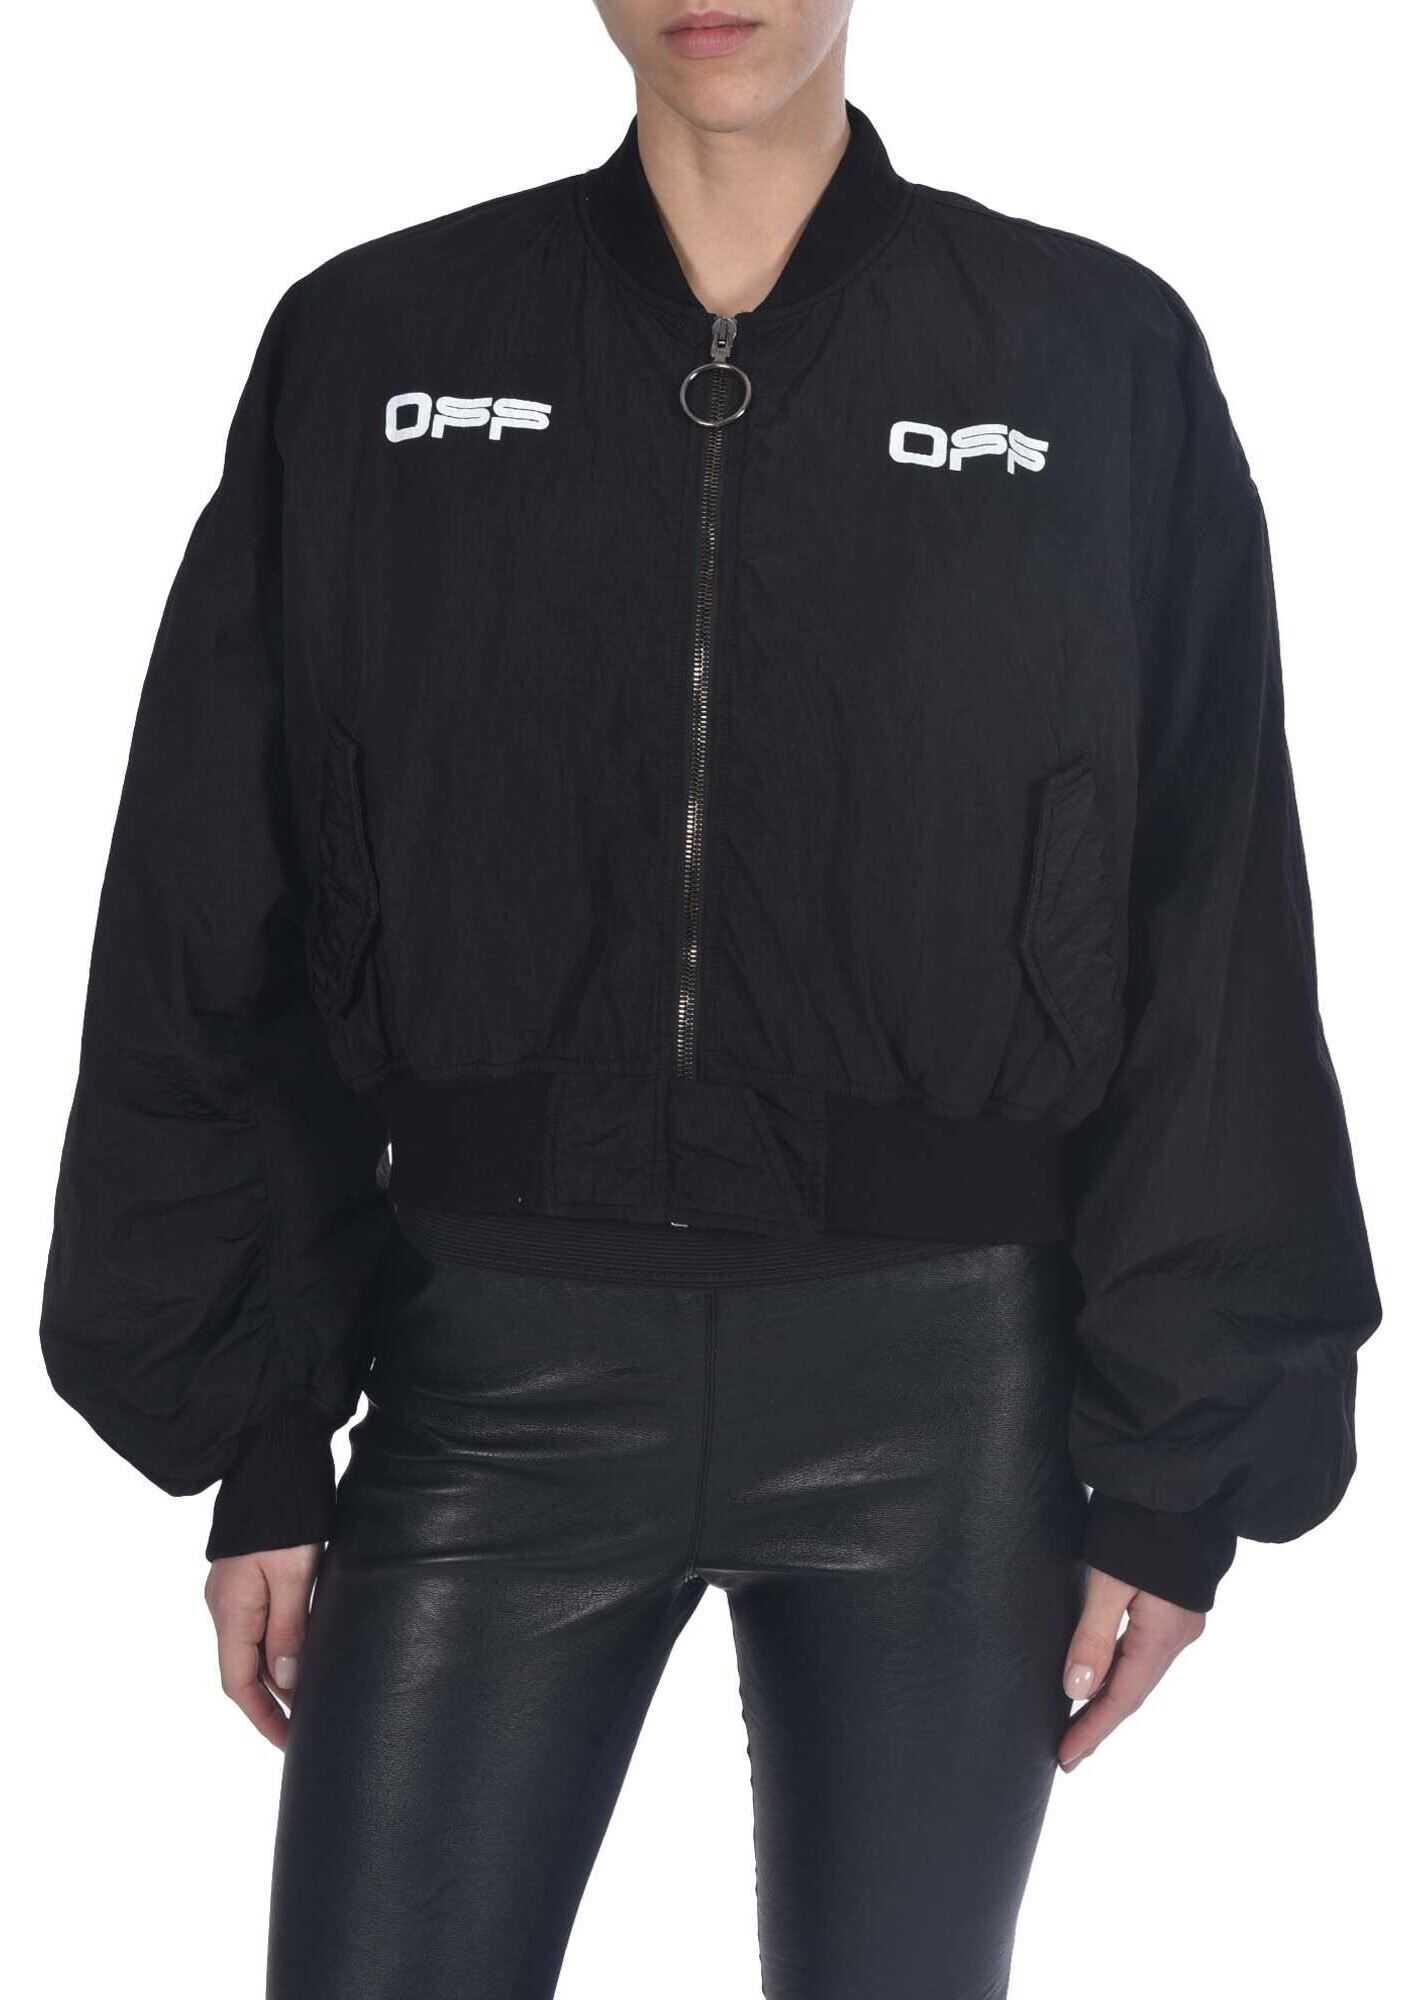 Off-White Cropped Jacket In Black Black